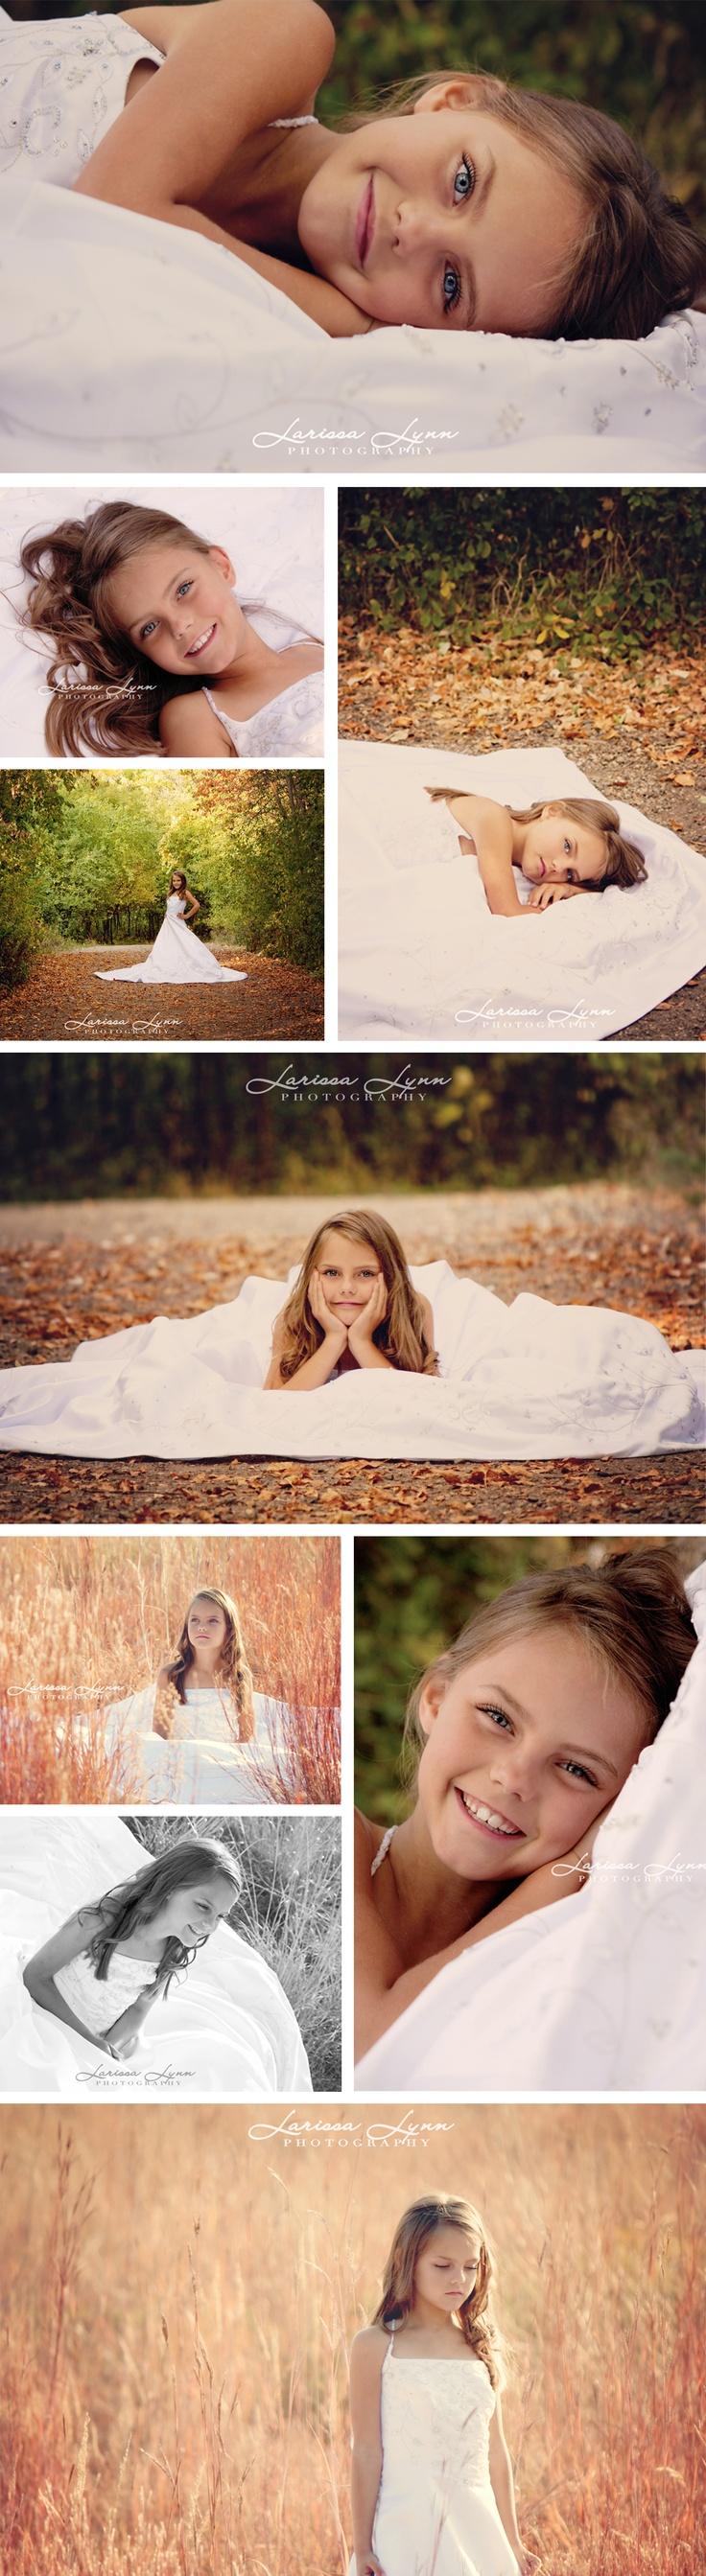 Quotmommy39s wedding dressquot photo credit larissa lynn for Wedding dresses sioux falls